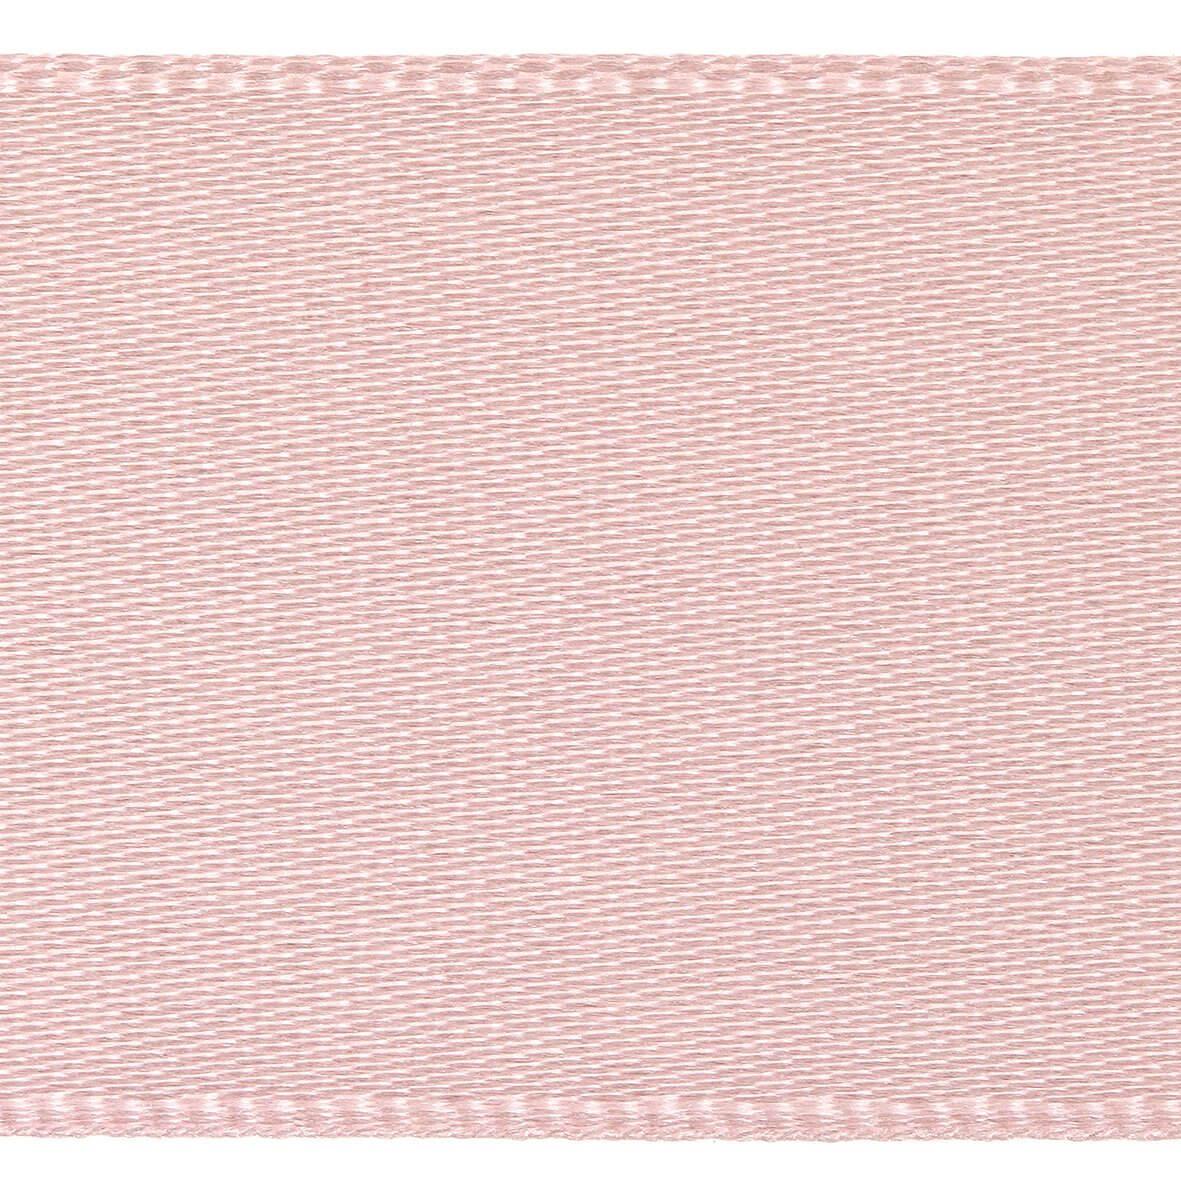 7mm Berisfords Satin Ribbon - Pale Pink Colour 70